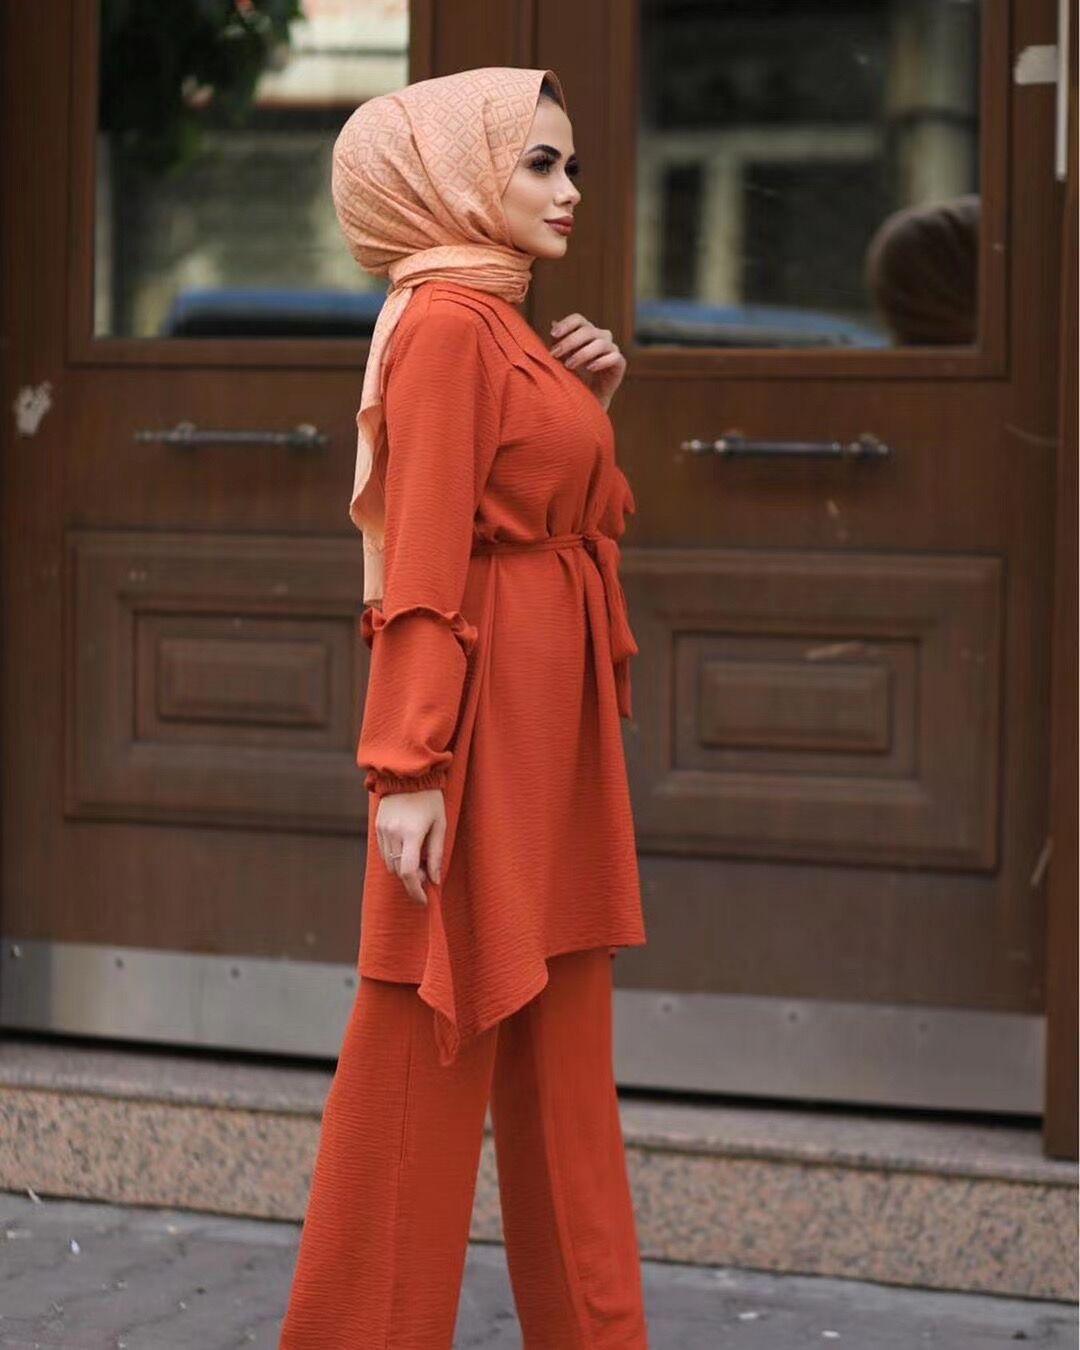 Eid Two Piece Muslim Sets Abaya Women Turkey Lace up Hijab Dress Caftan Moroccan Kaftan Islam